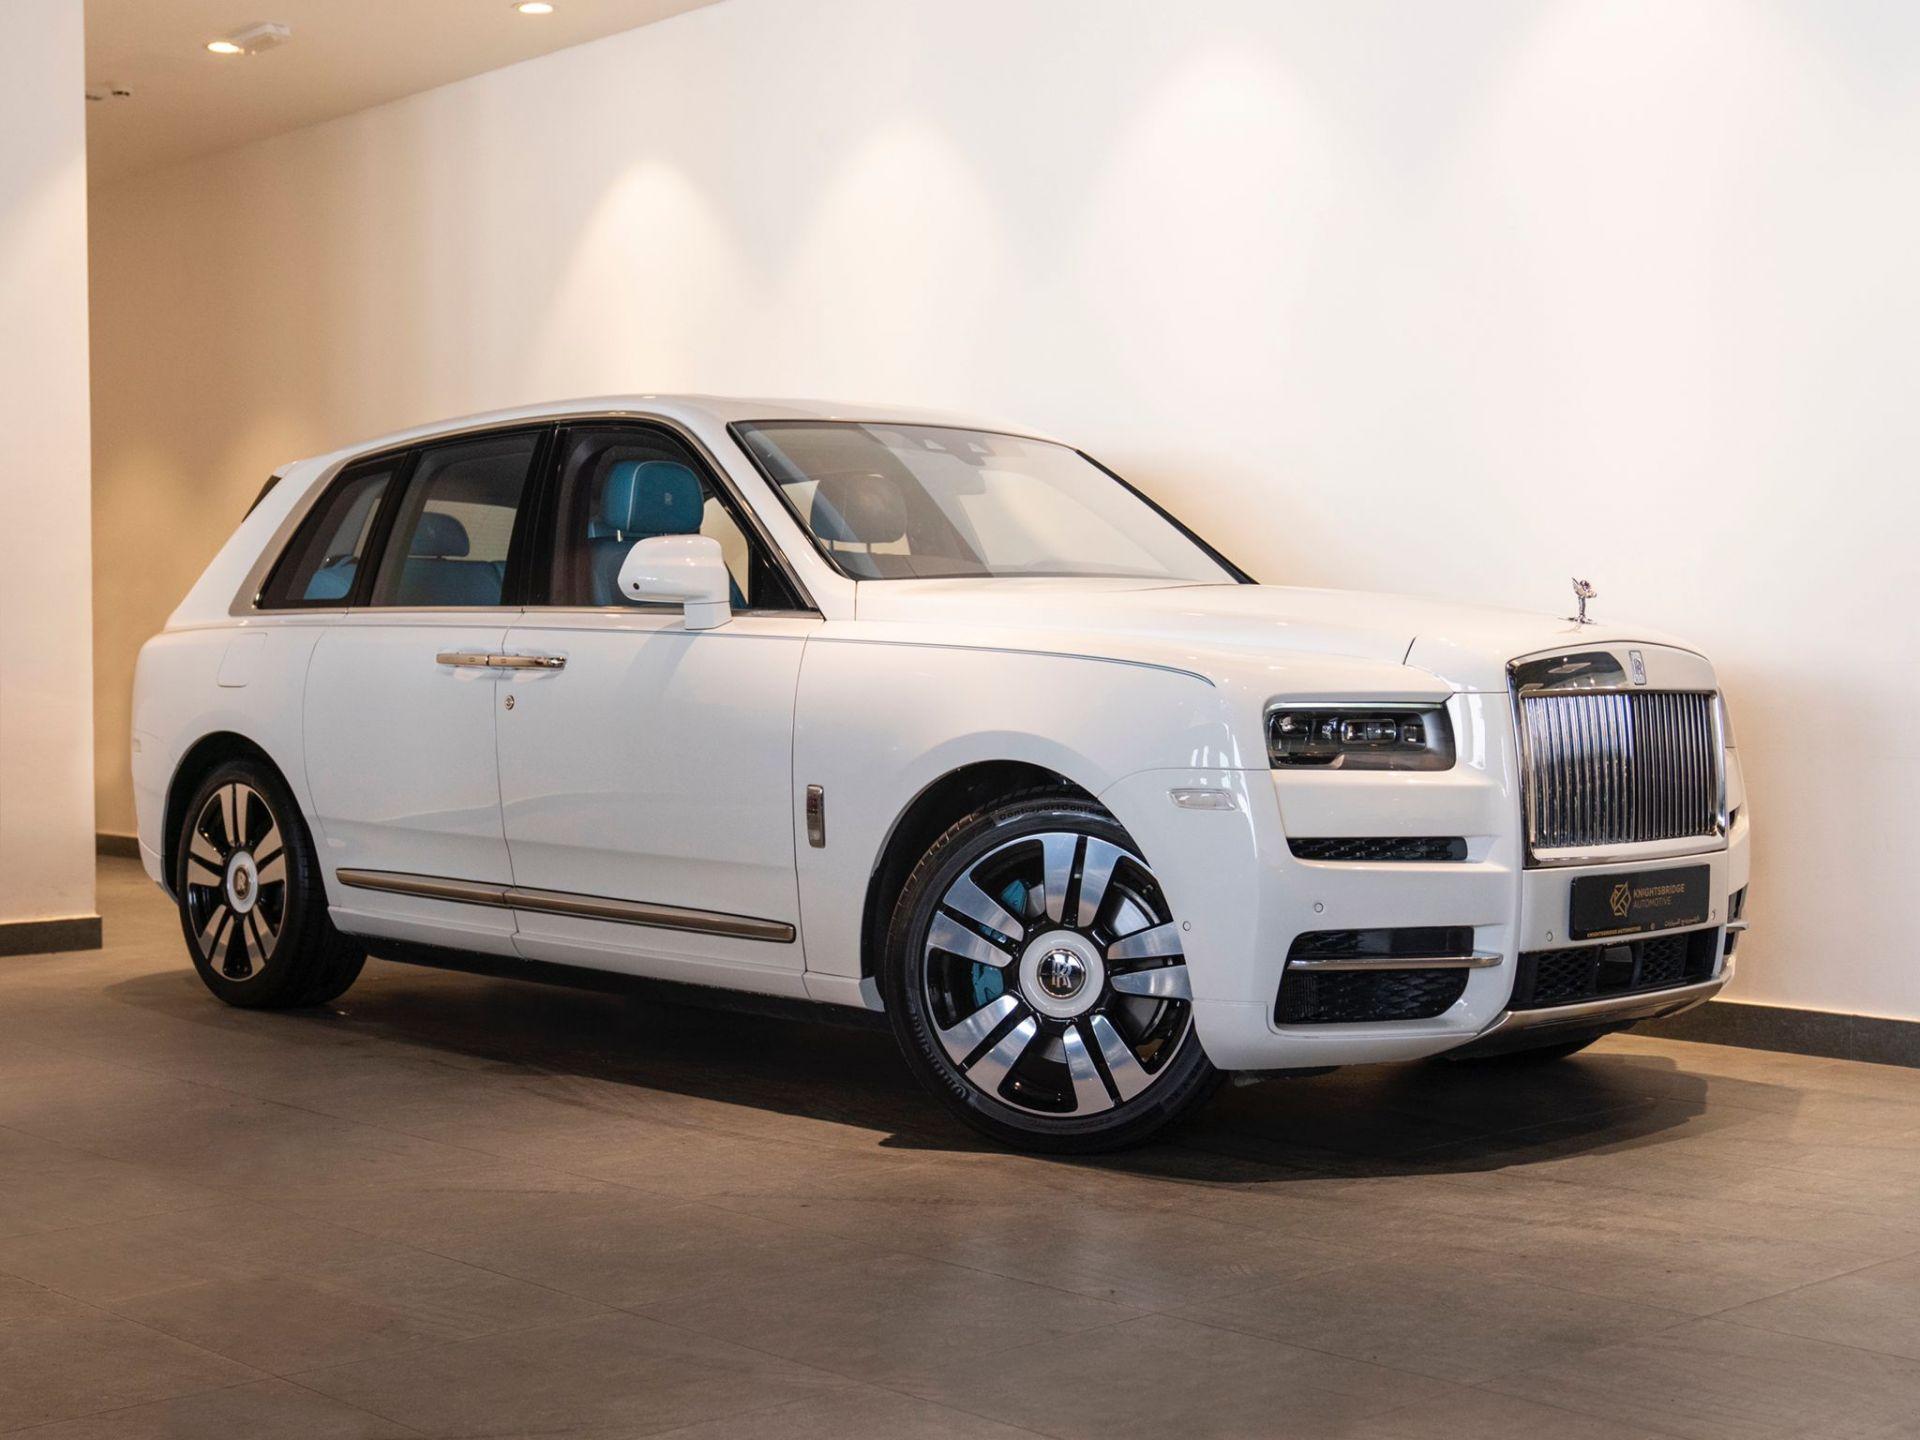 2021 Rolls-Royce Cullinan at Knightsbridge Automotive - (10061 - 1)